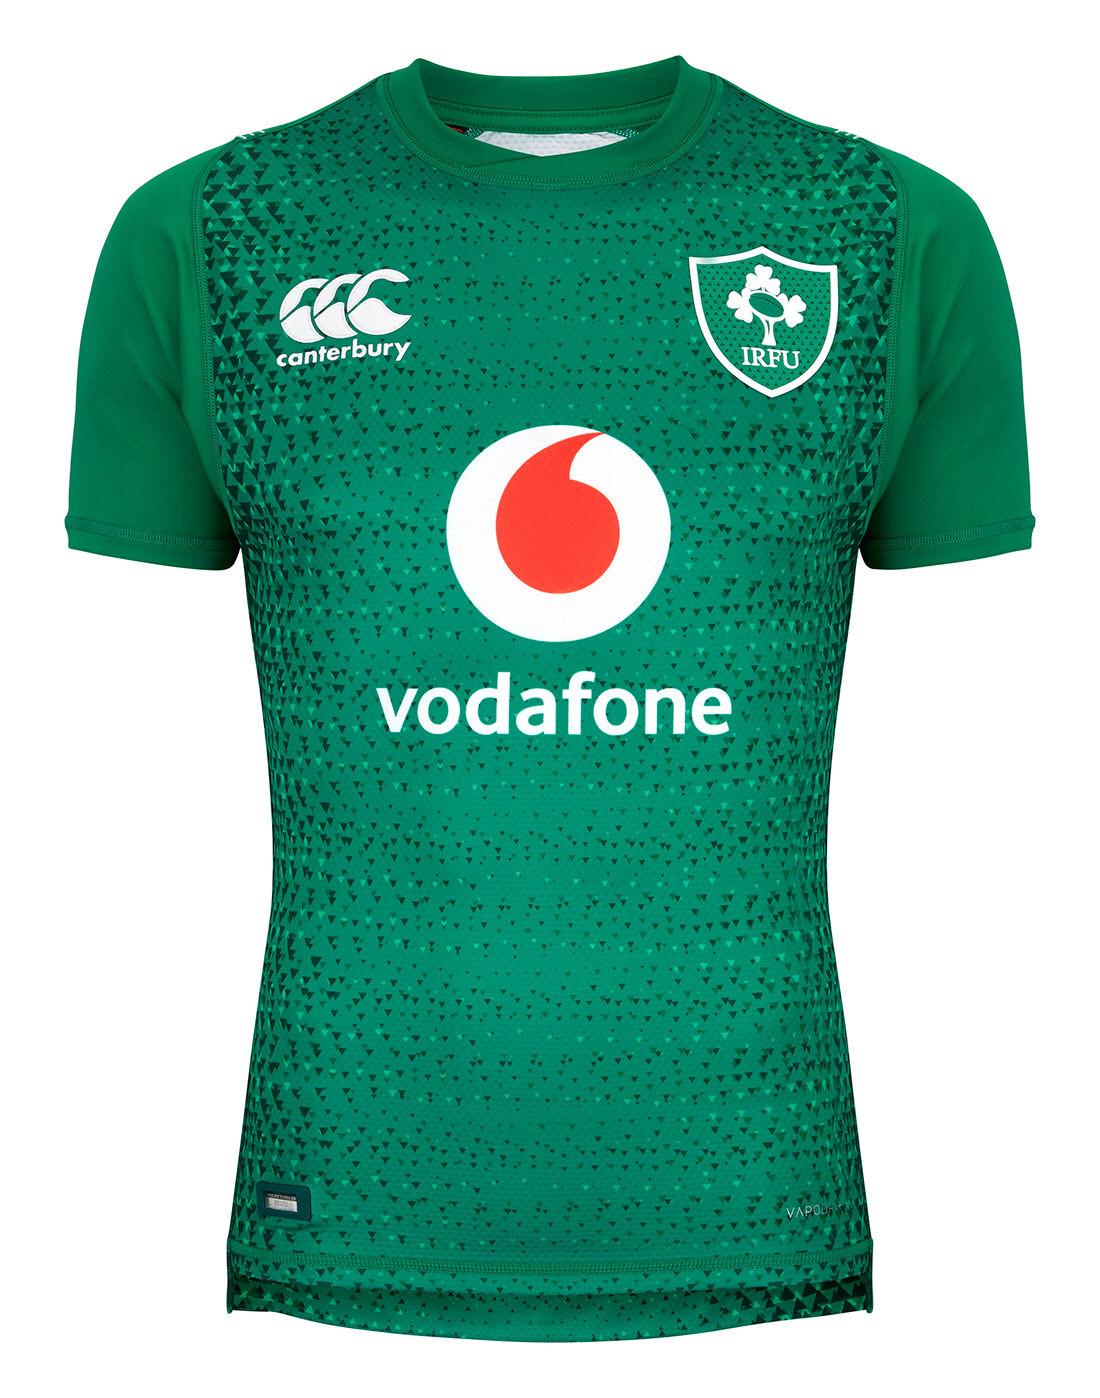 Adult Jersey Test Ireland Home 201819 4Oq4rw